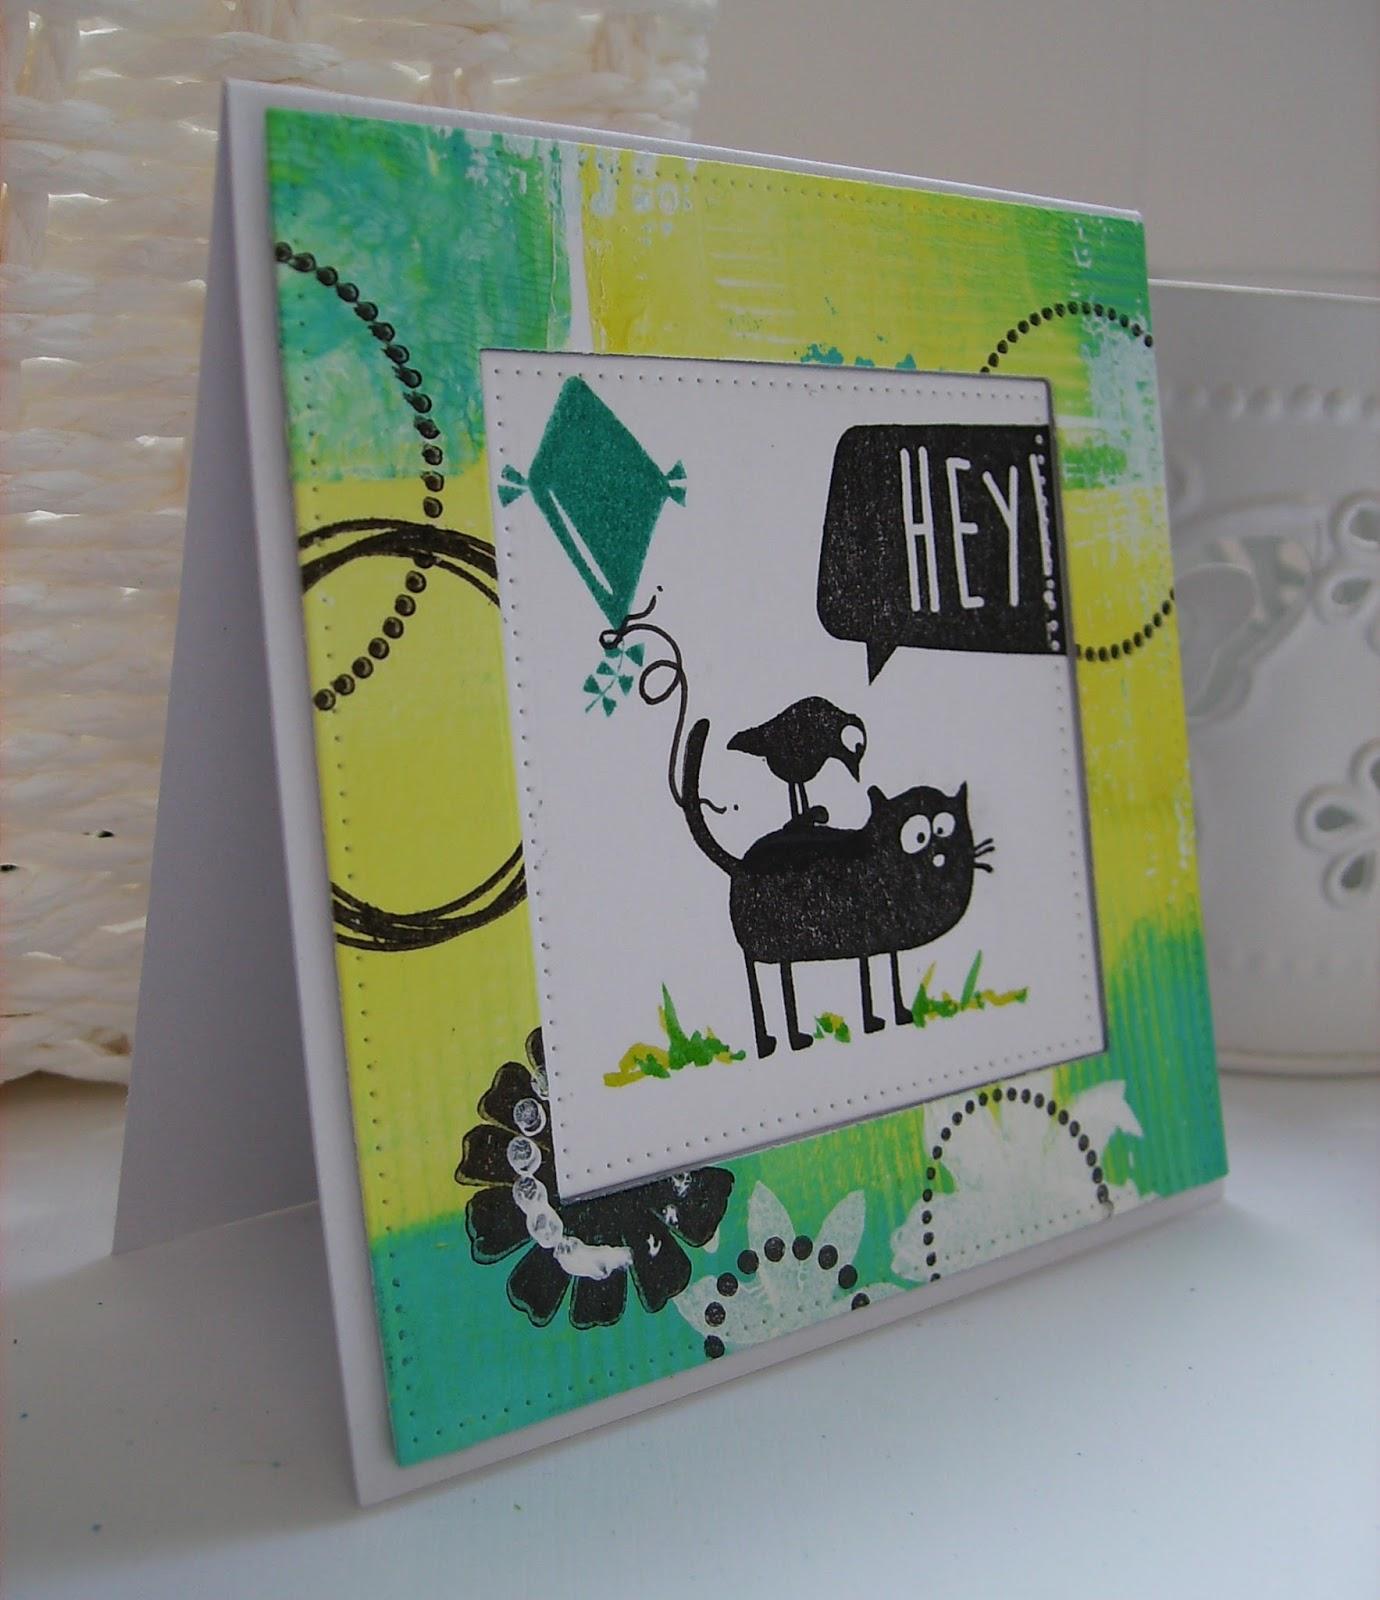 scrapcolour gelli plate 2 cats on appletrees. Black Bedroom Furniture Sets. Home Design Ideas